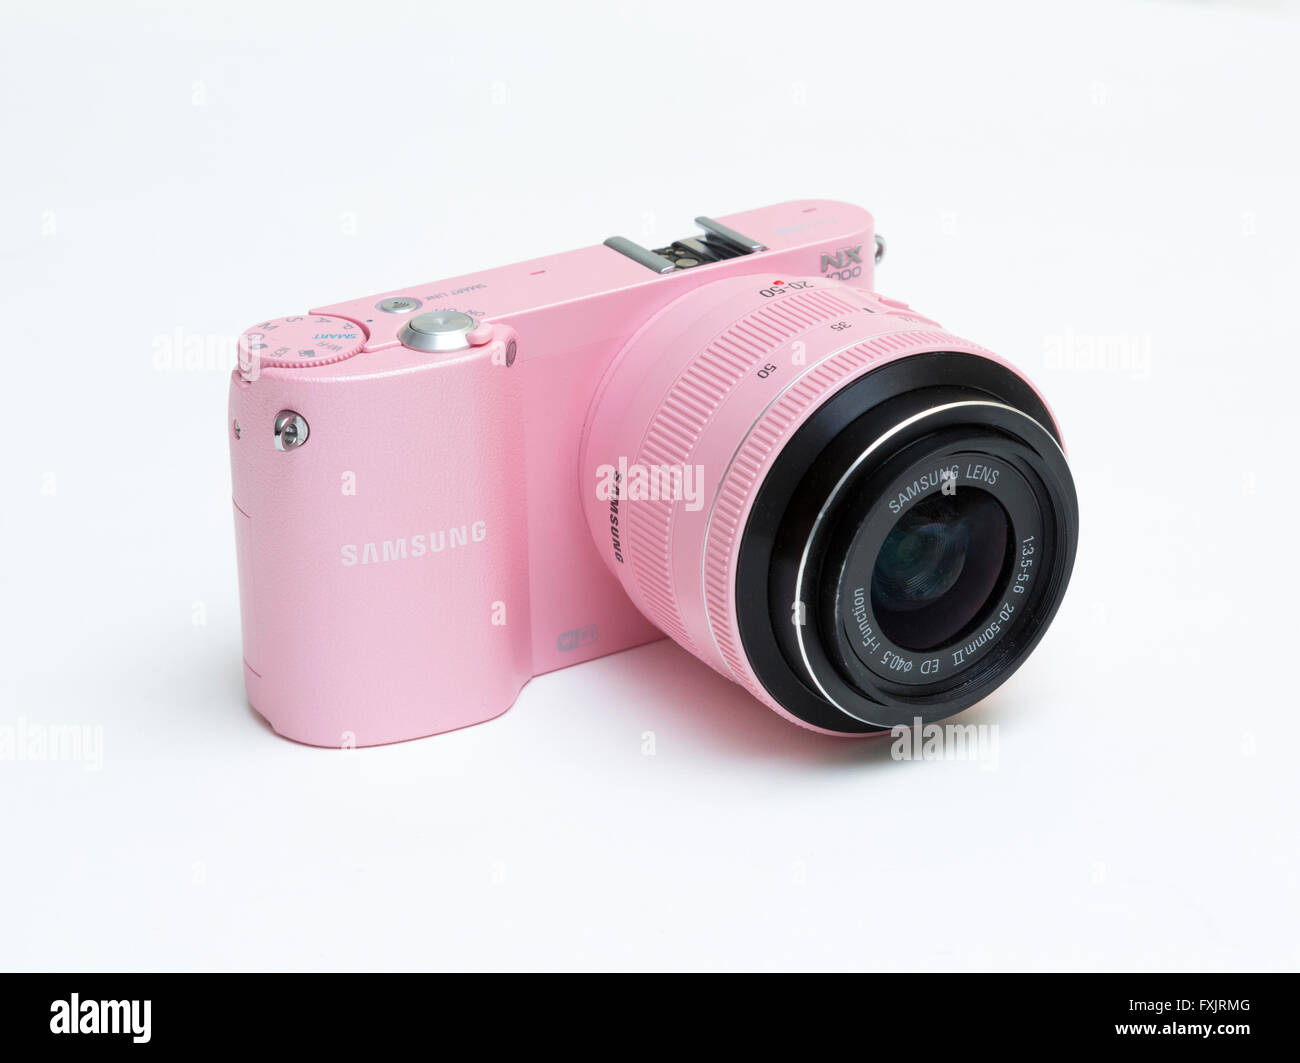 Pink Samsung fotocamera digitale Immagini Stock